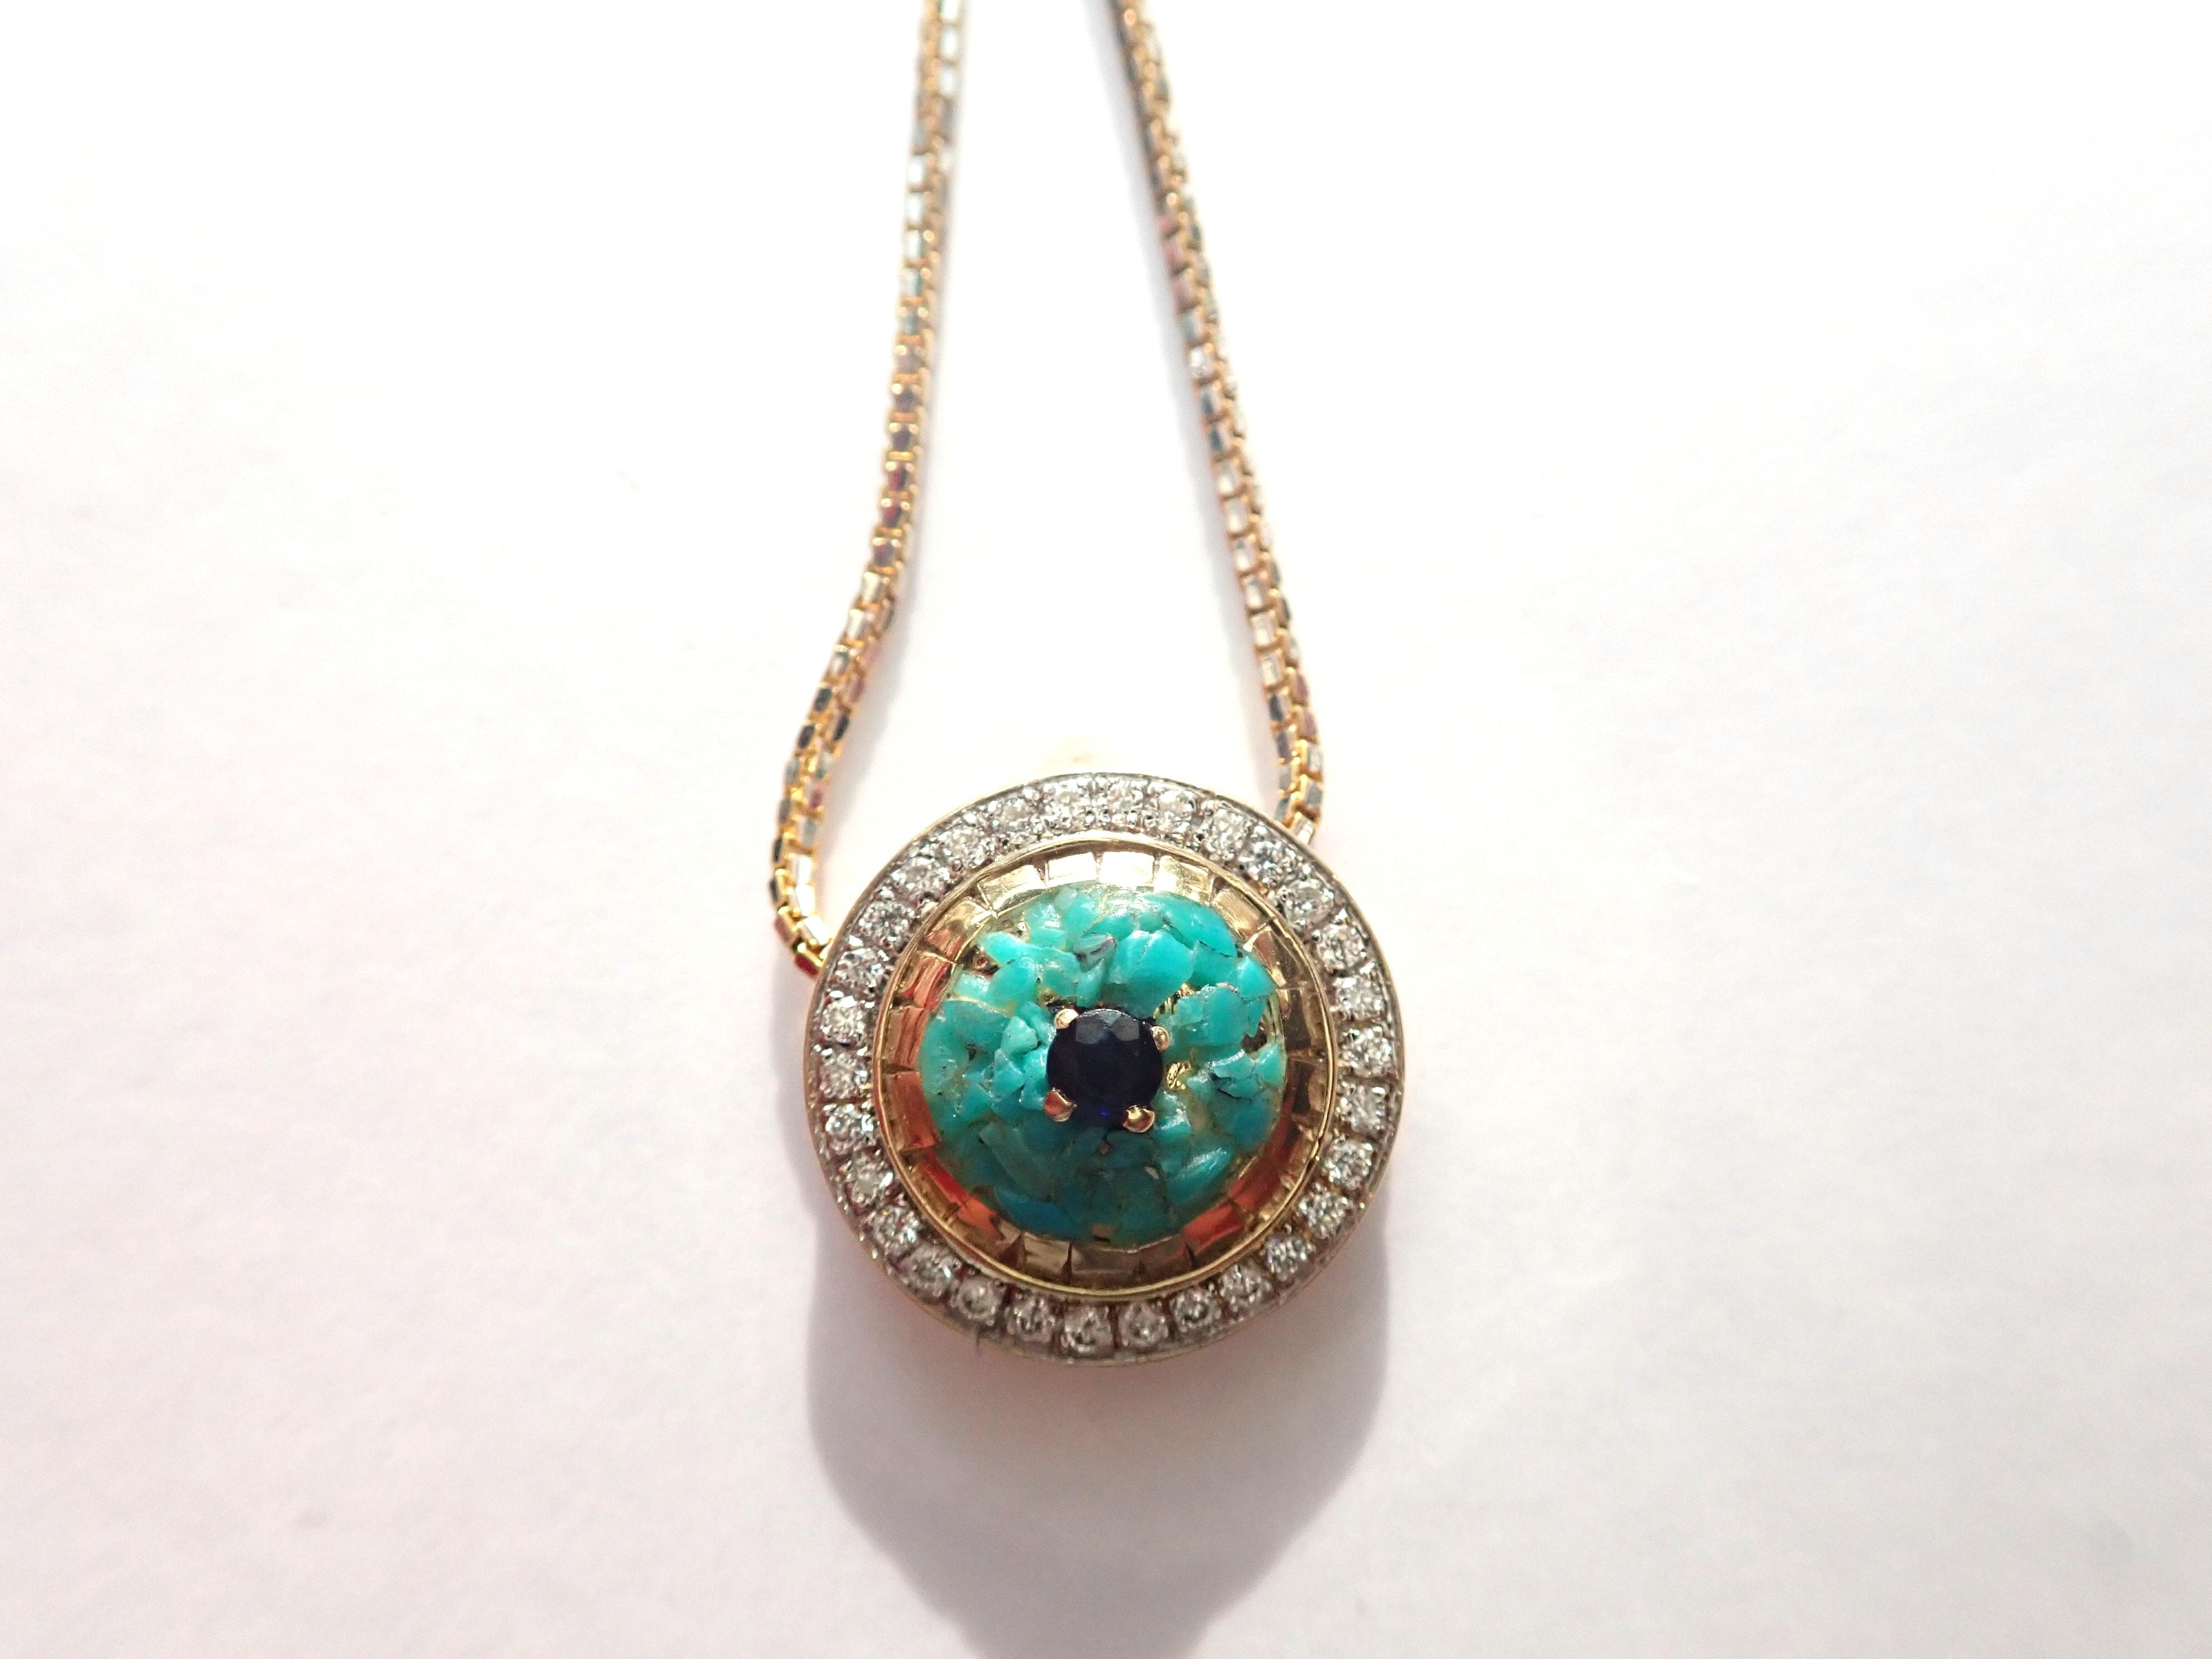 AA000943 - 14ct Yellow Gold Diamond Sapphire  & Turquoise Good Luck Evil eye, Mati, 18 inch Box Chain - 5gms #140